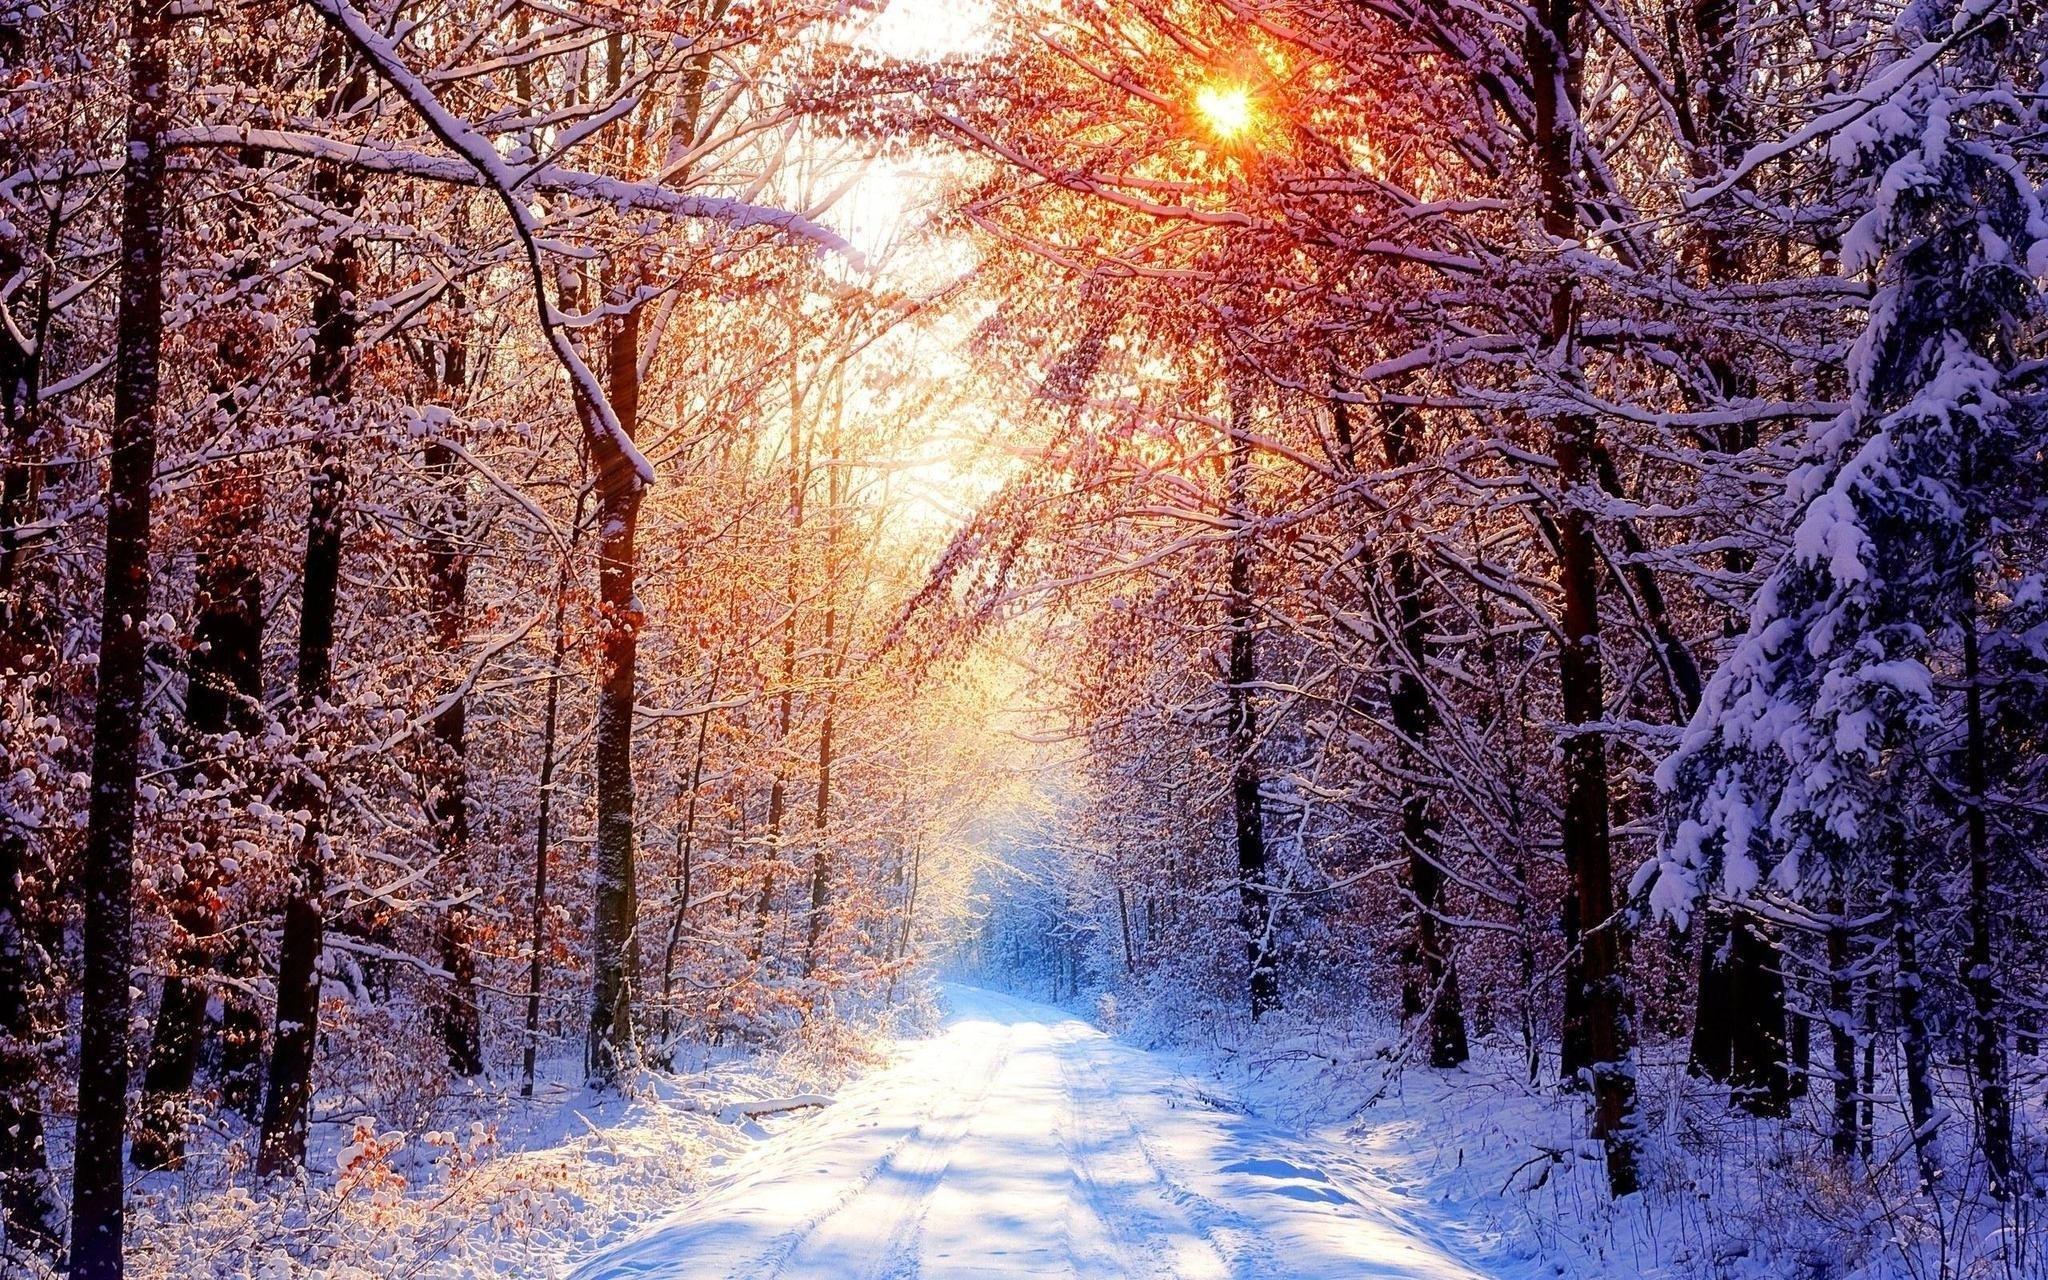 snow scenes wallpaper (56+ images)